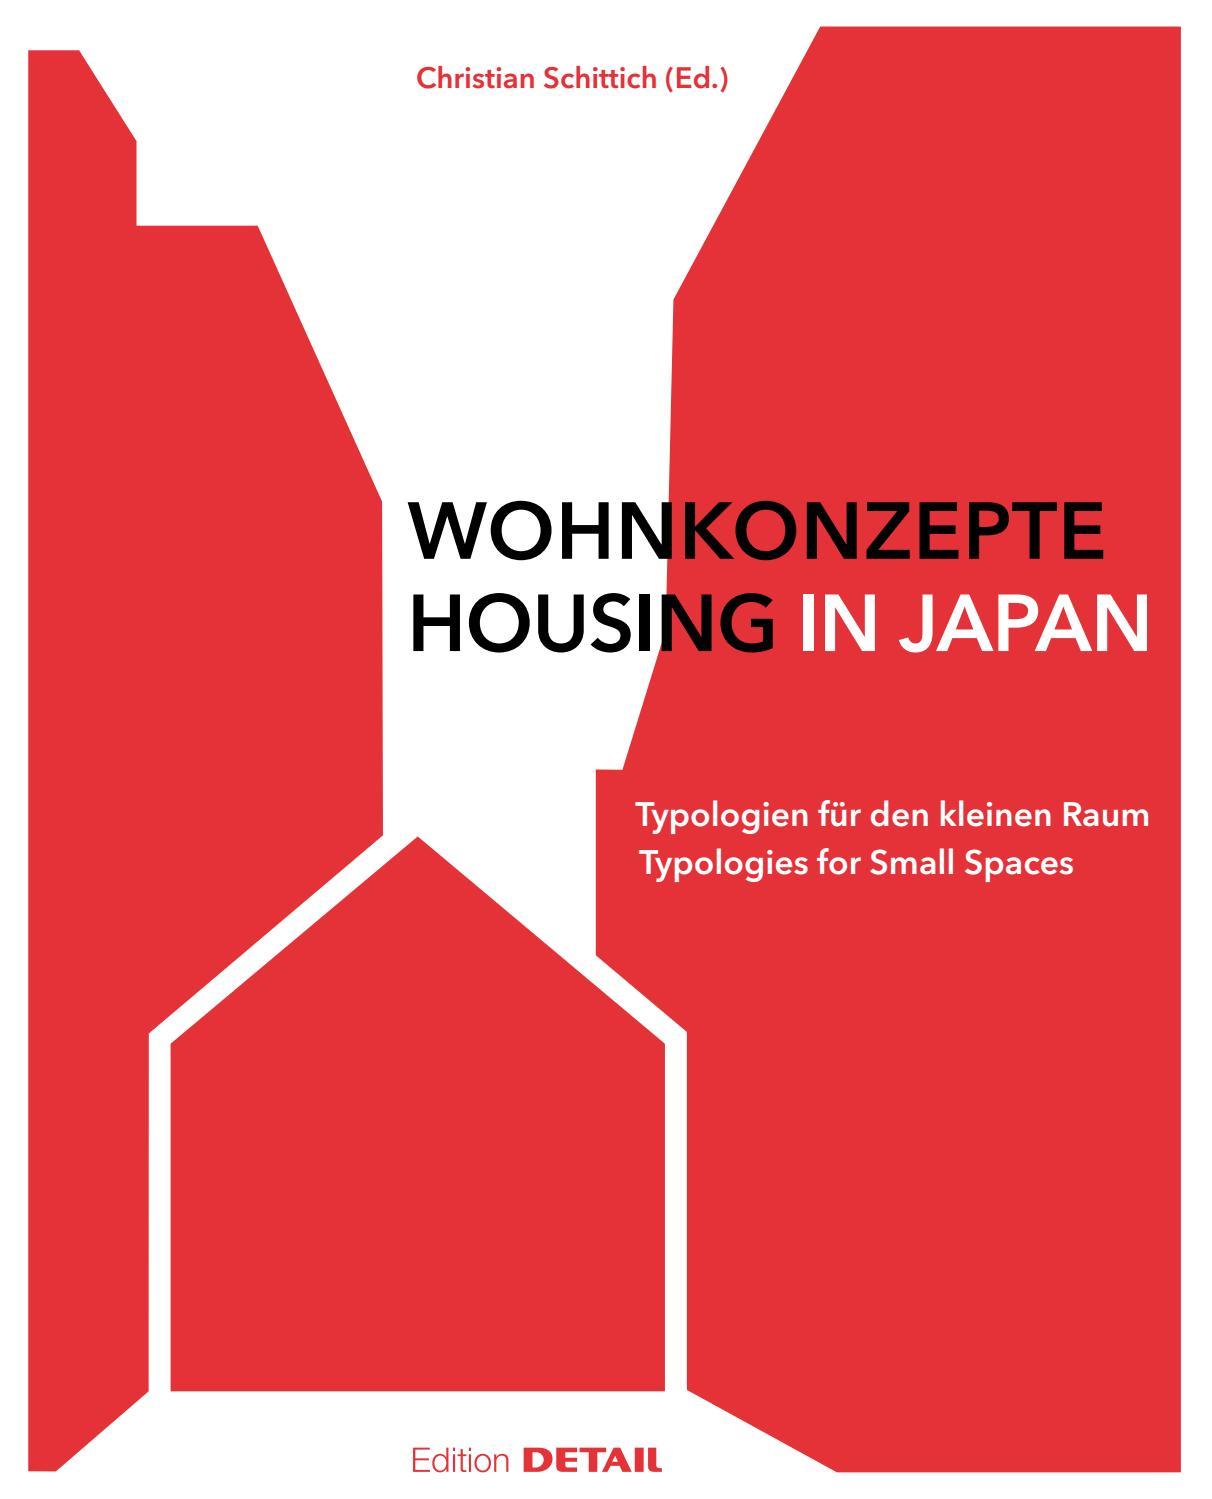 Wohnkonzepte in Japan / Housing in Japan by DETAIL - issuu